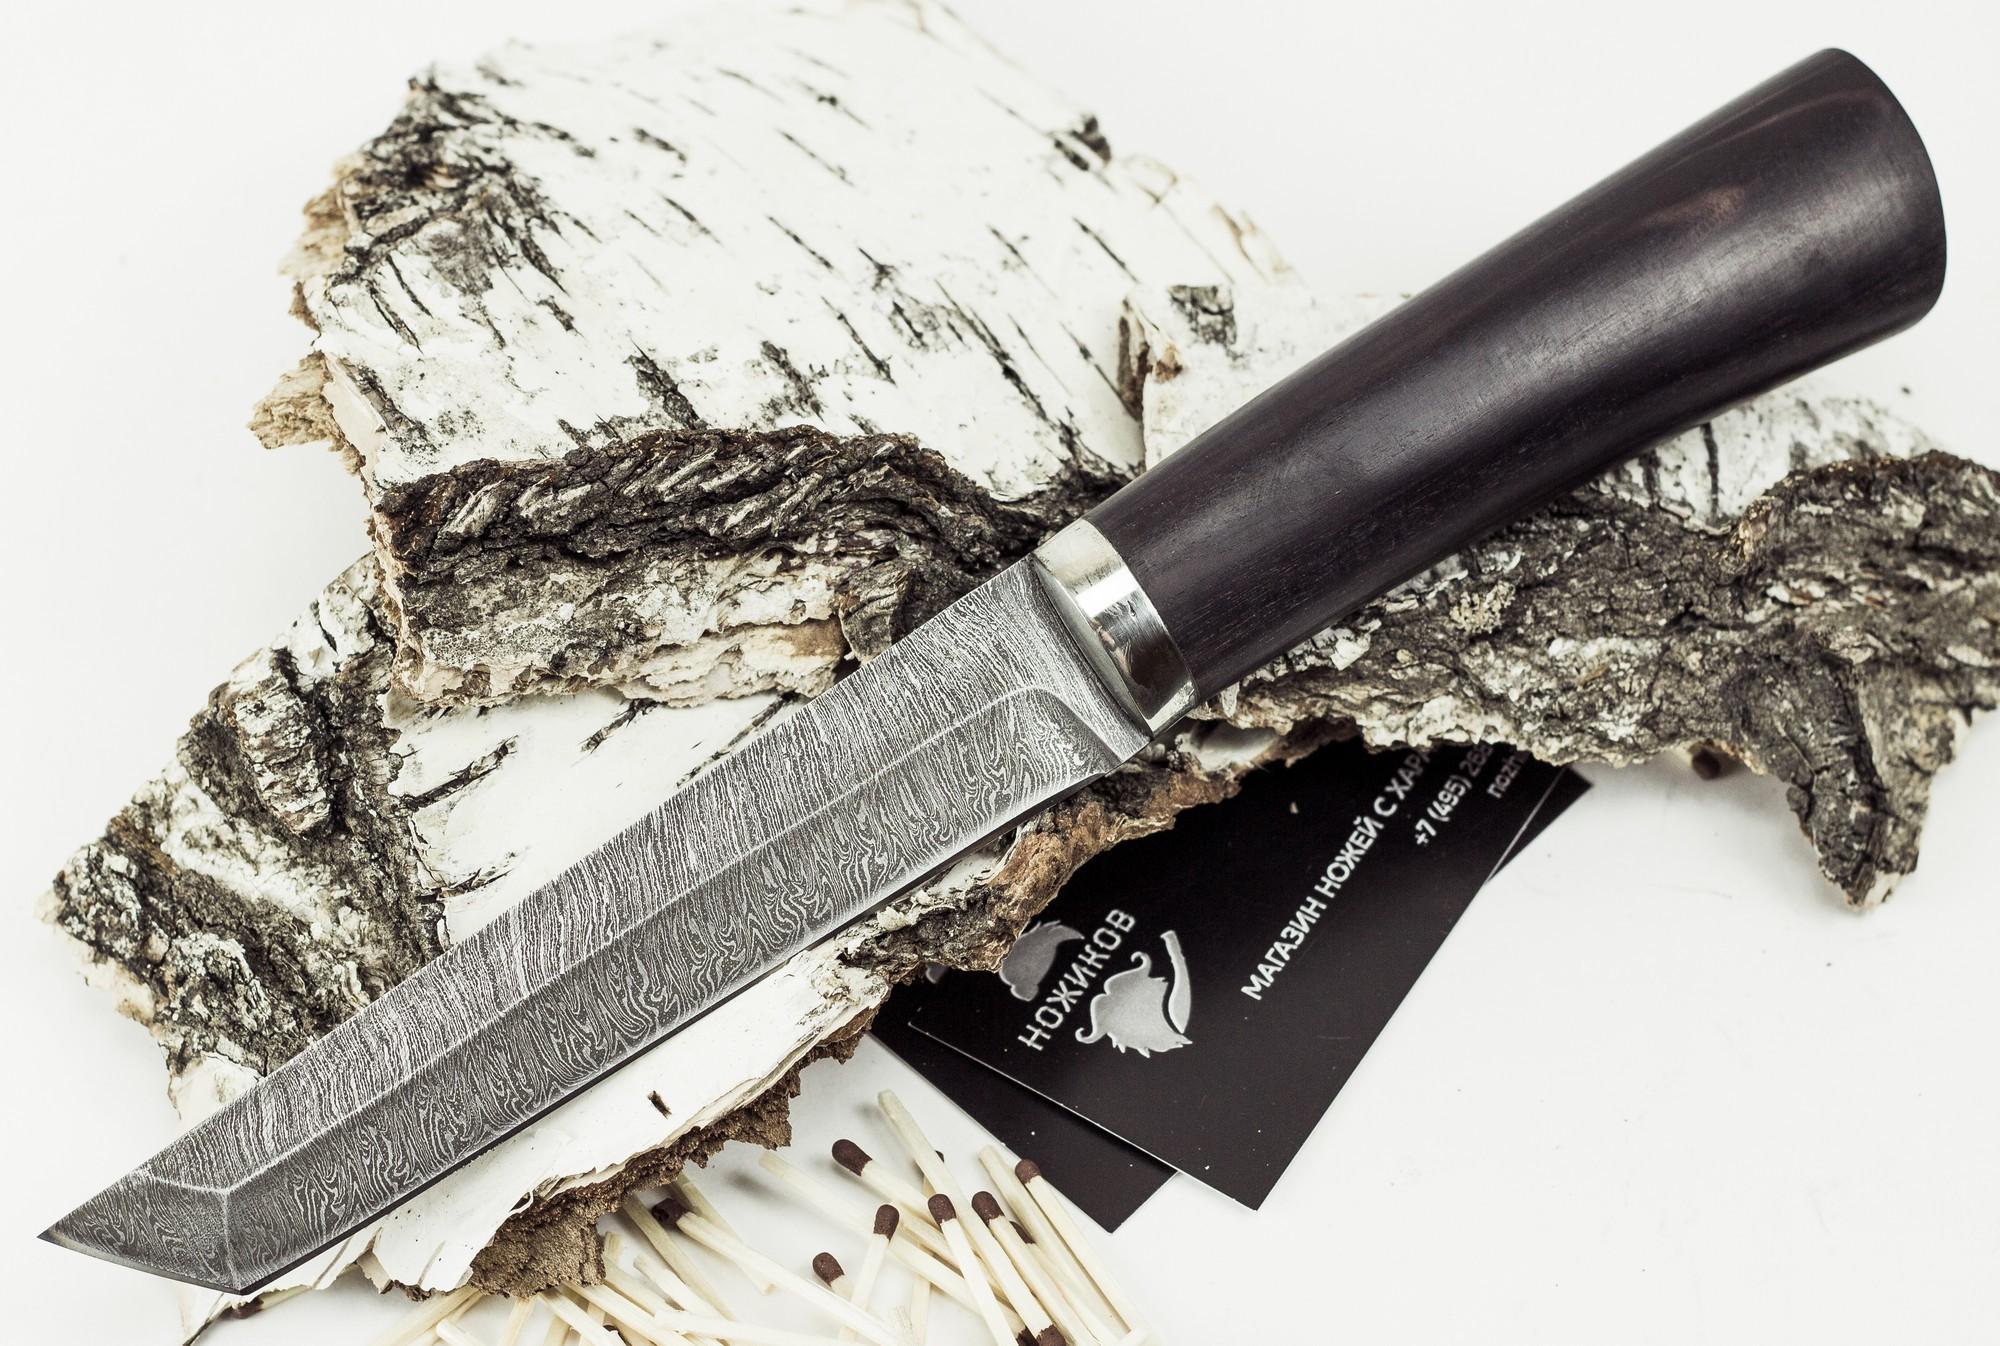 Нож Японец, дамасская стальНожи Ворсма<br>Нож Японец, дамасская сталь<br>